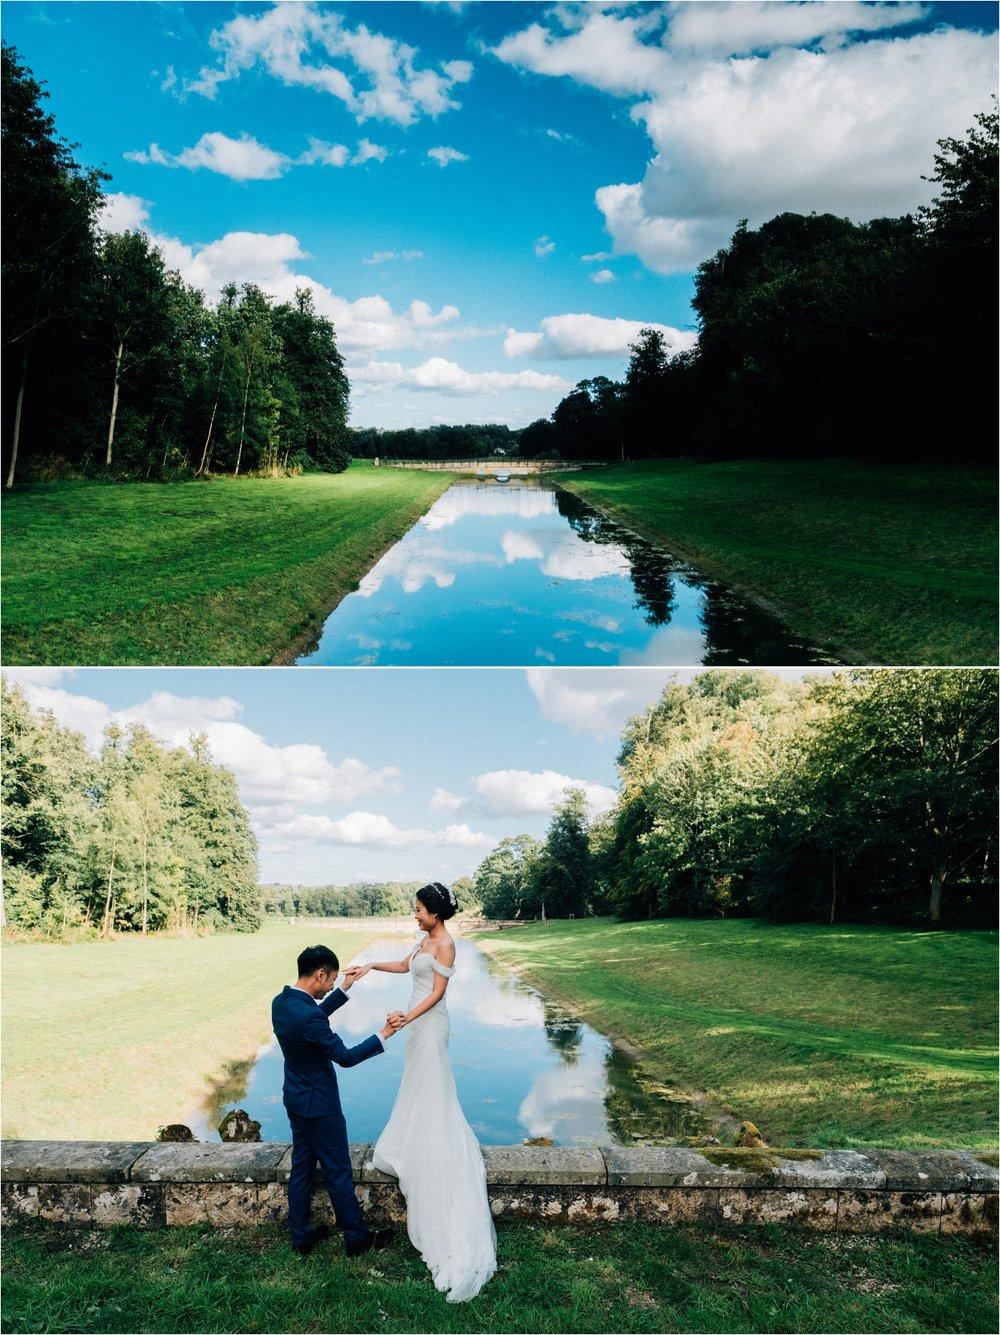 York city elopement wedding photographer_0193.jpg